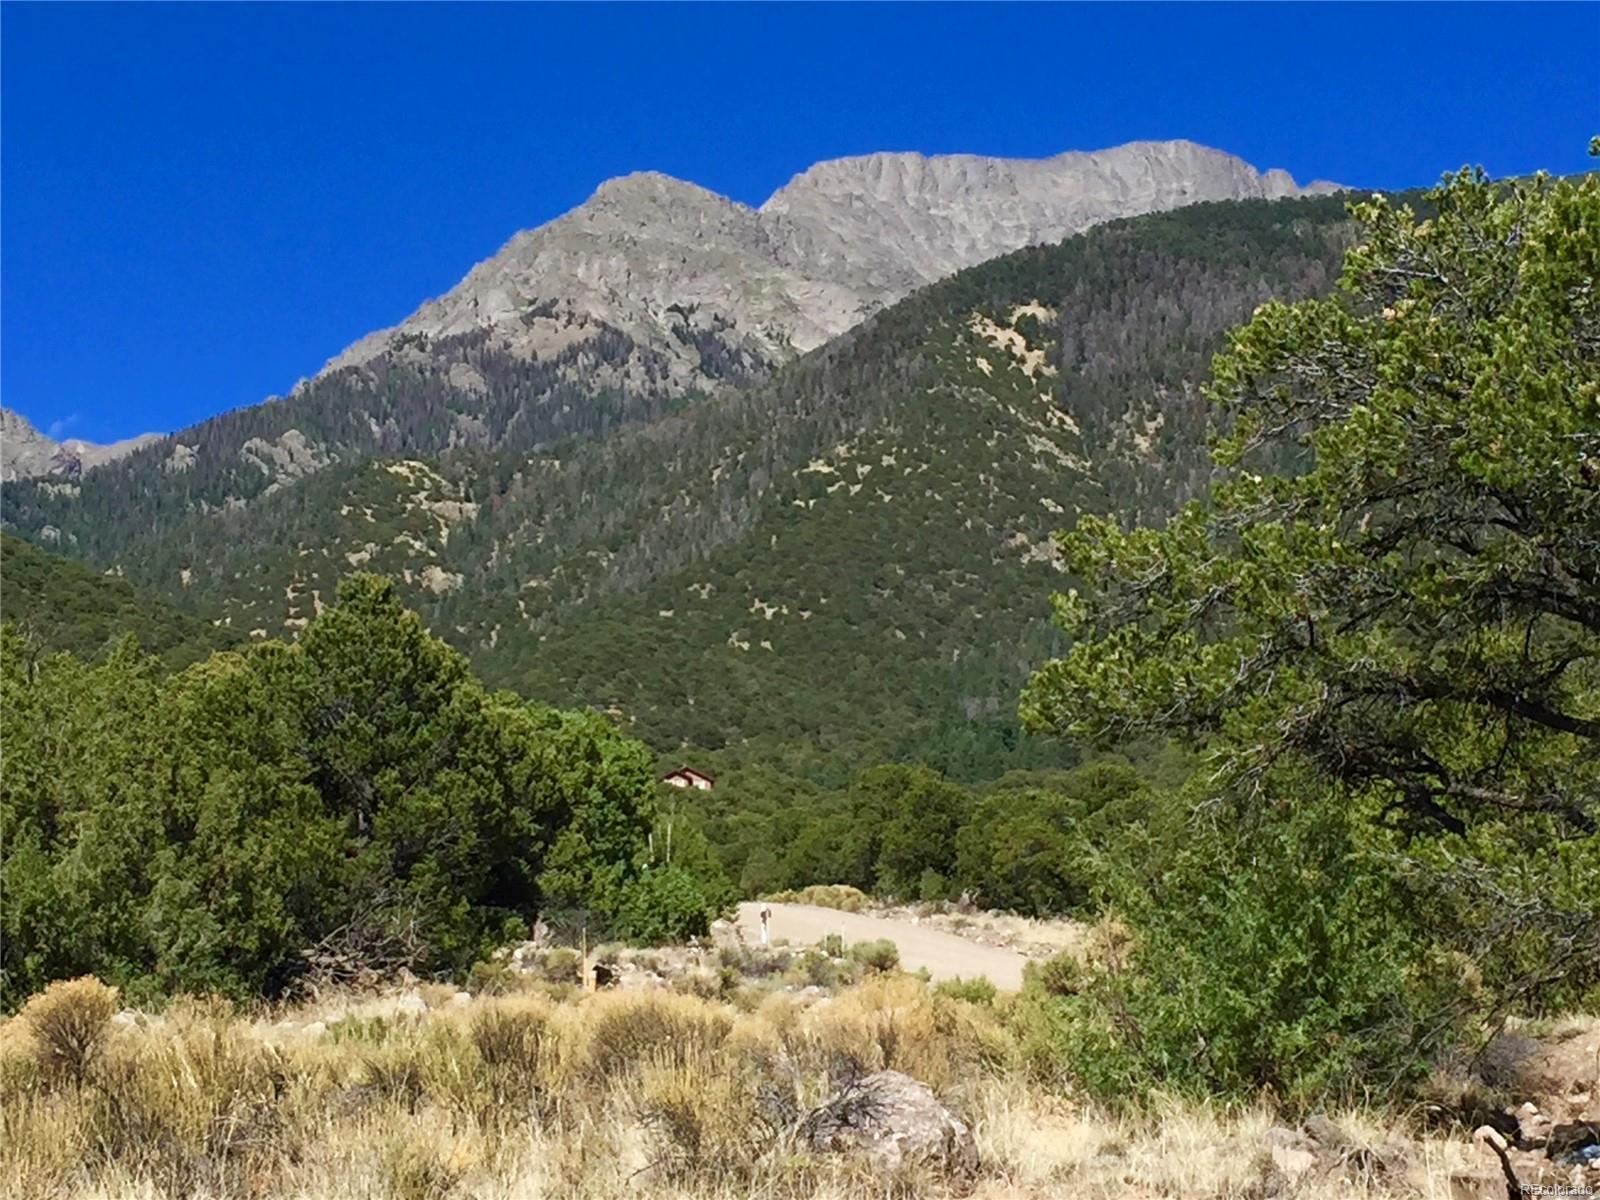 1792 Summitview Way, Crestone, CO 81131 - Crestone, CO real estate listing